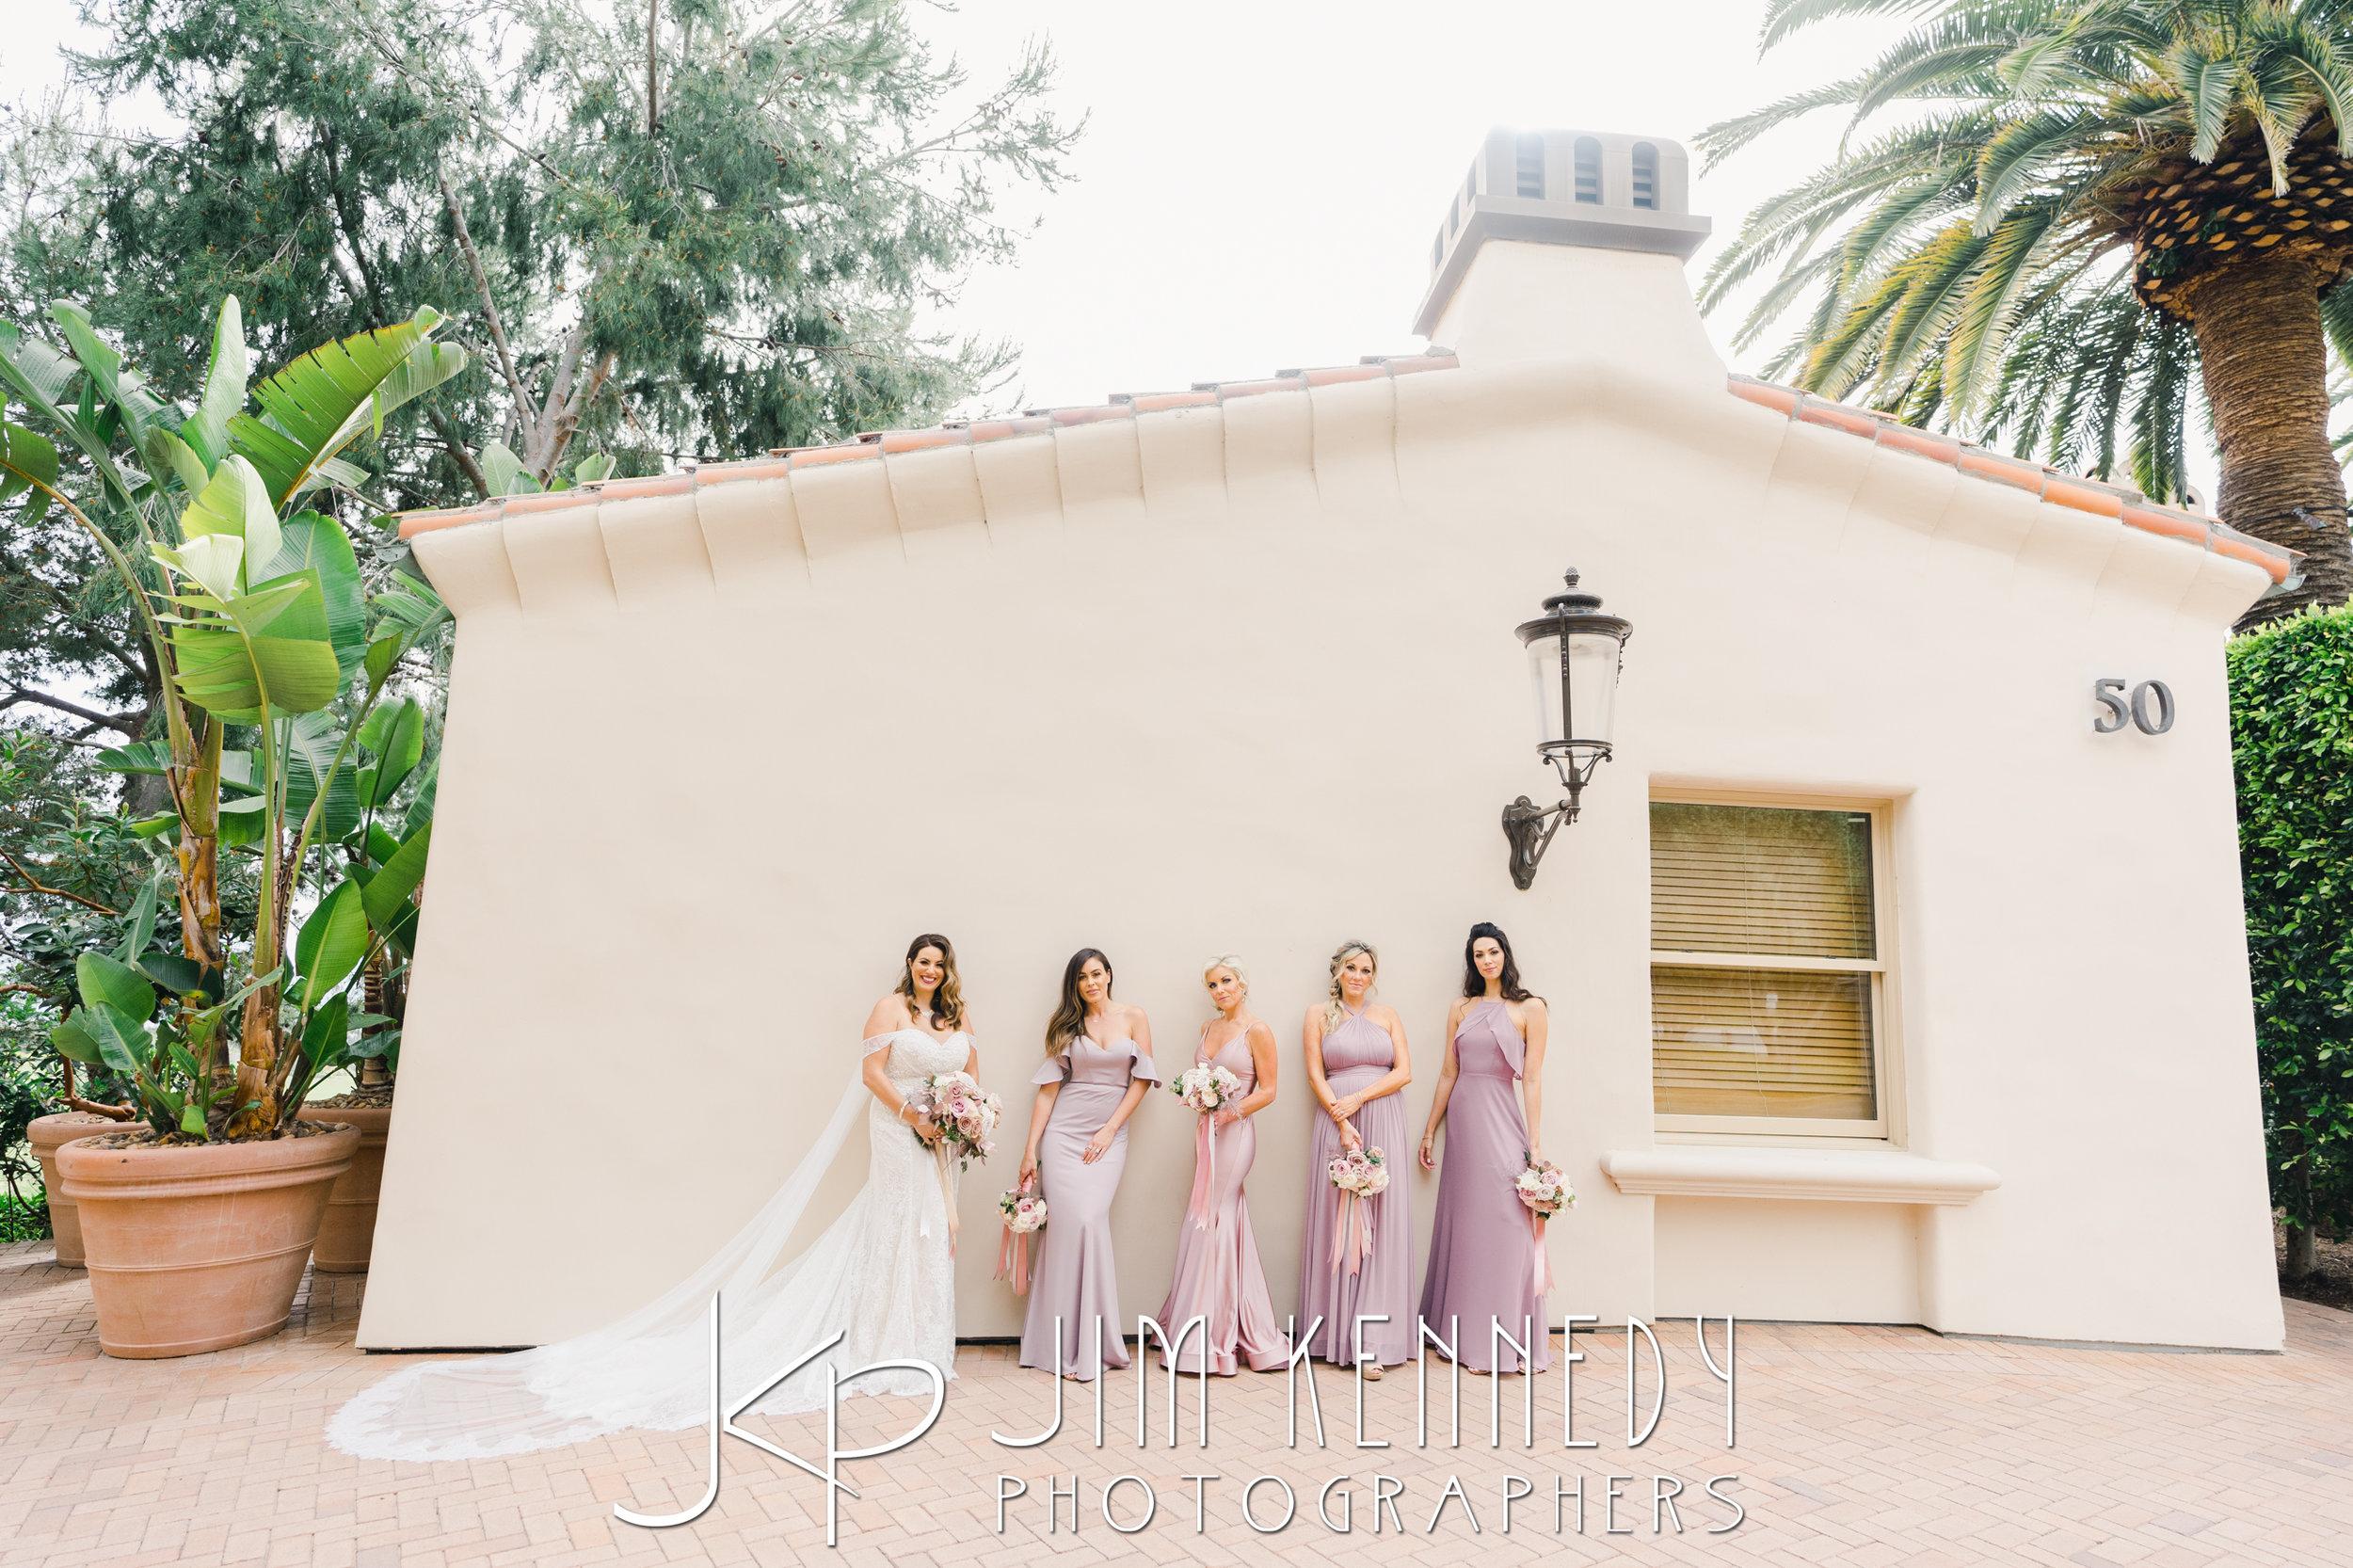 pelican-hill-wedding-jim-kenedy-photographers_0067.JPG